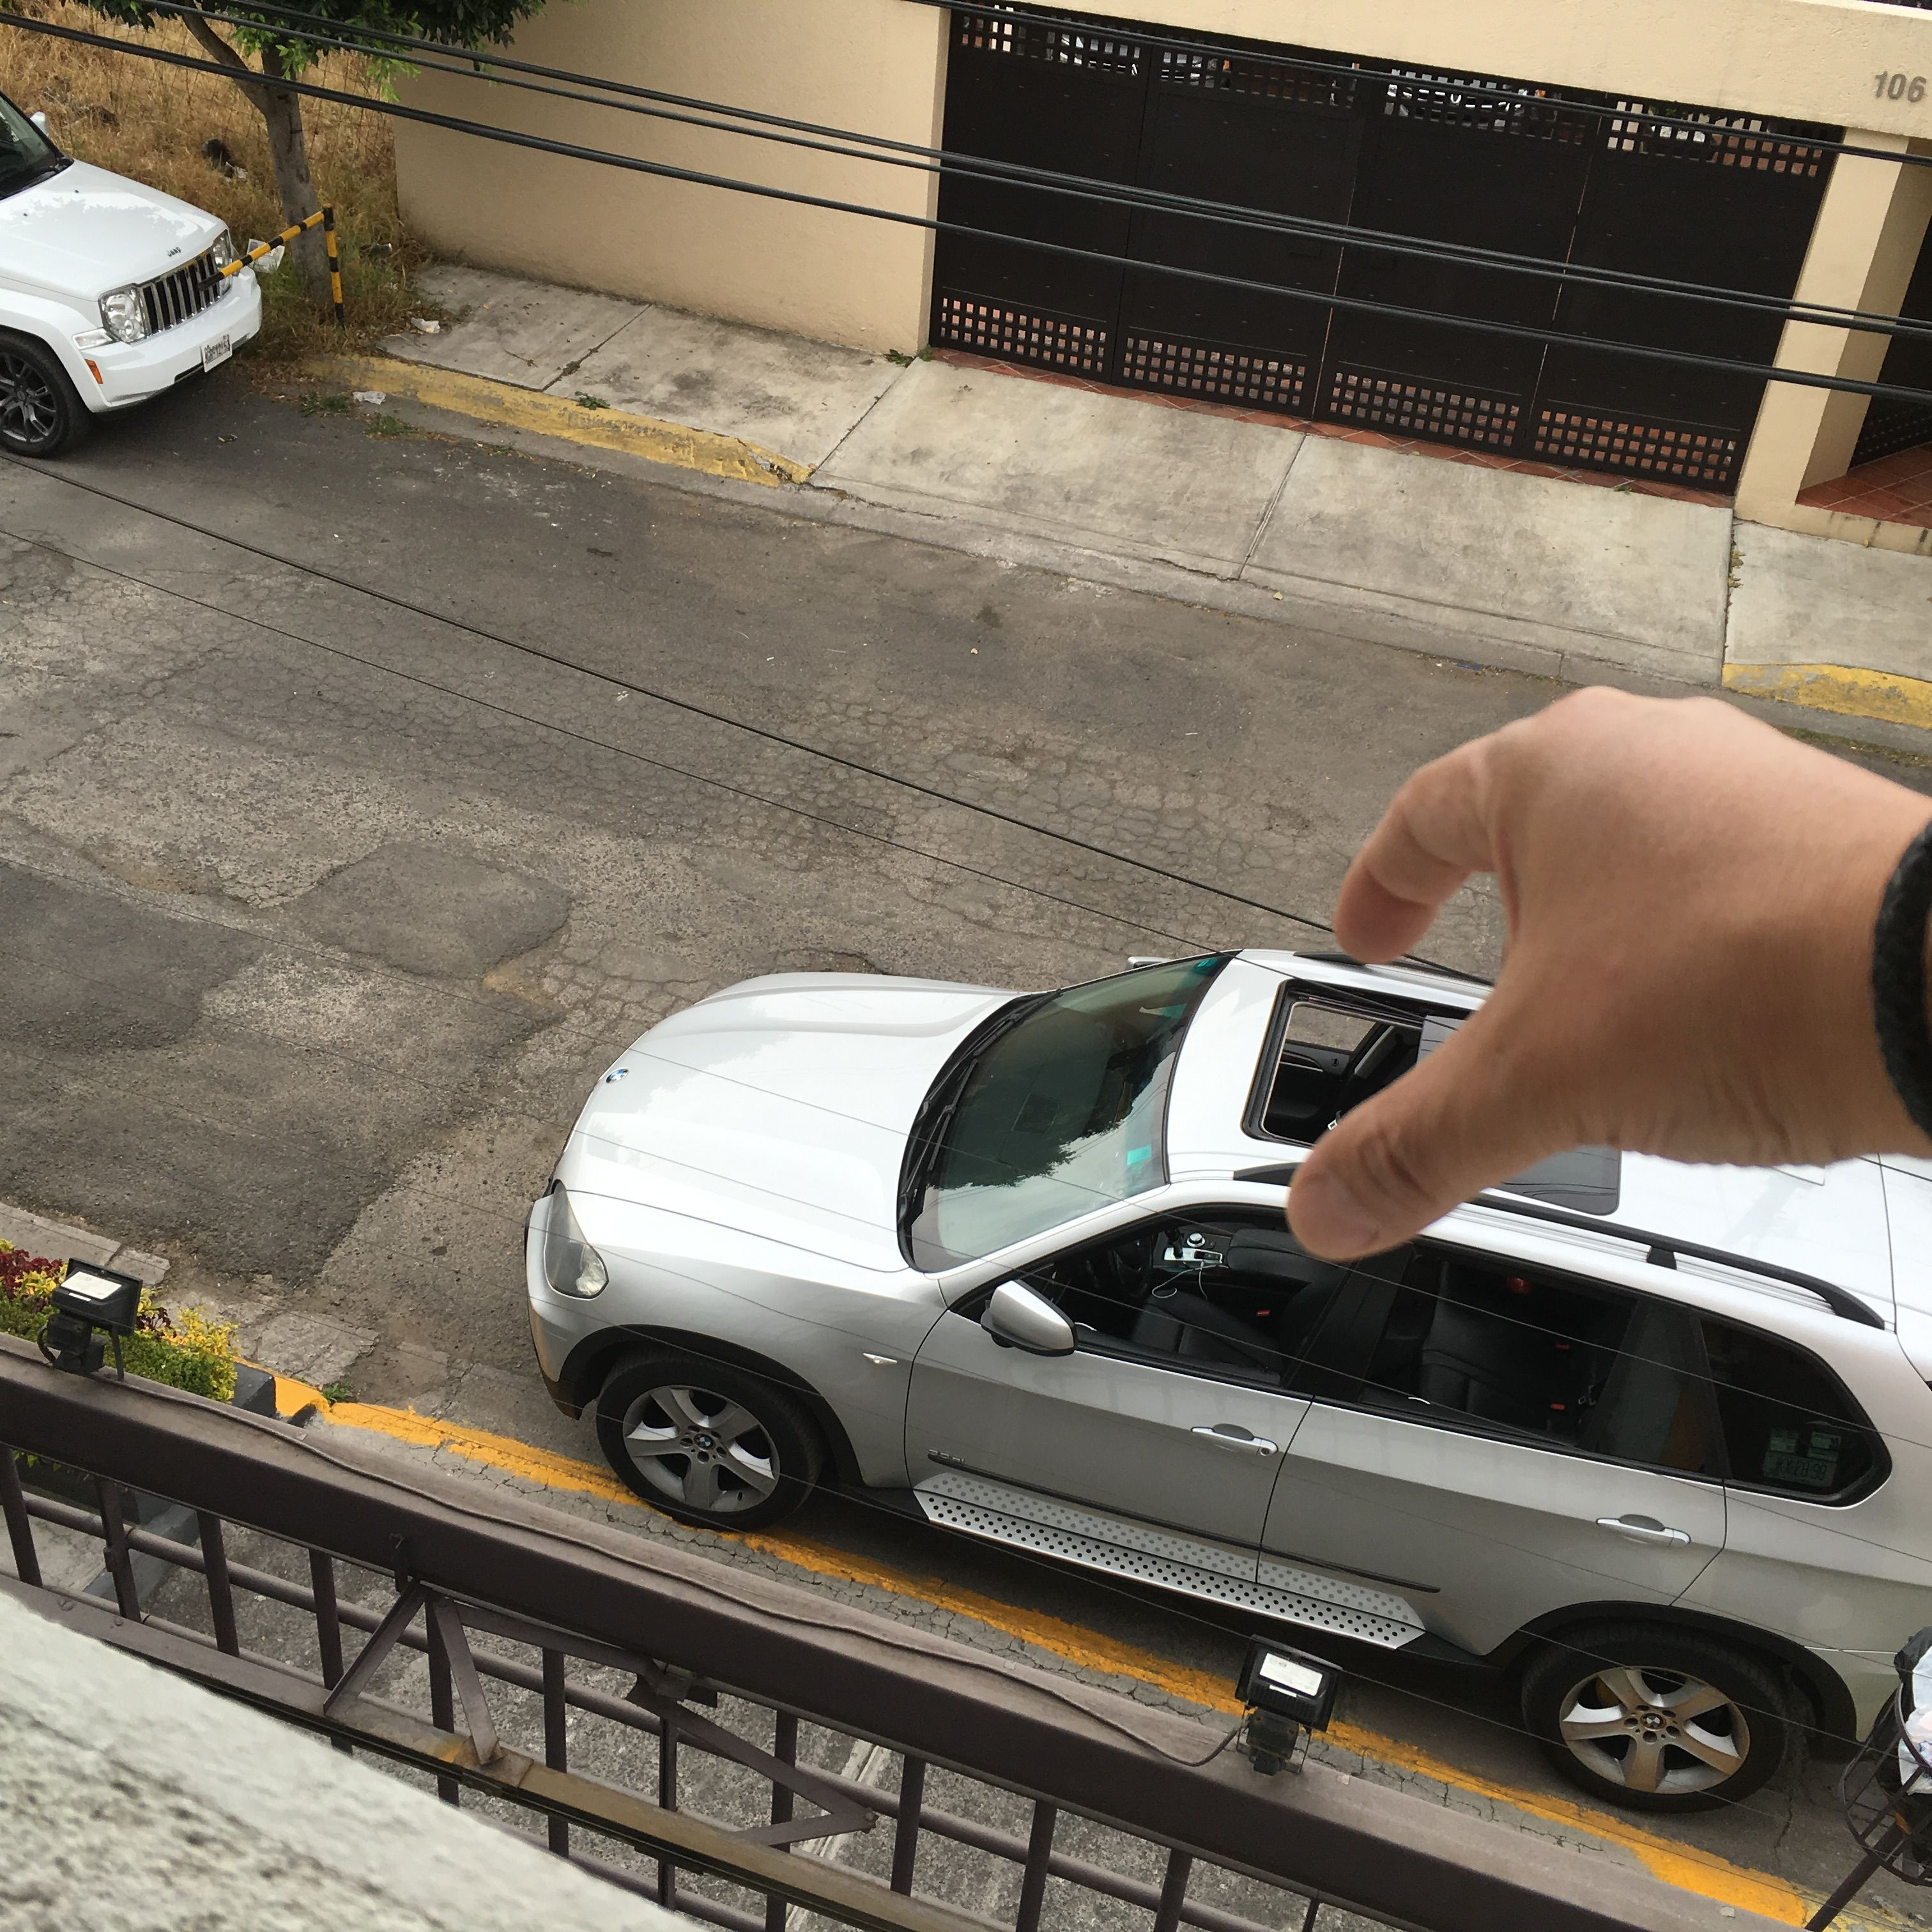 Luxury car toys  Juguete X  Coches  Pinterest